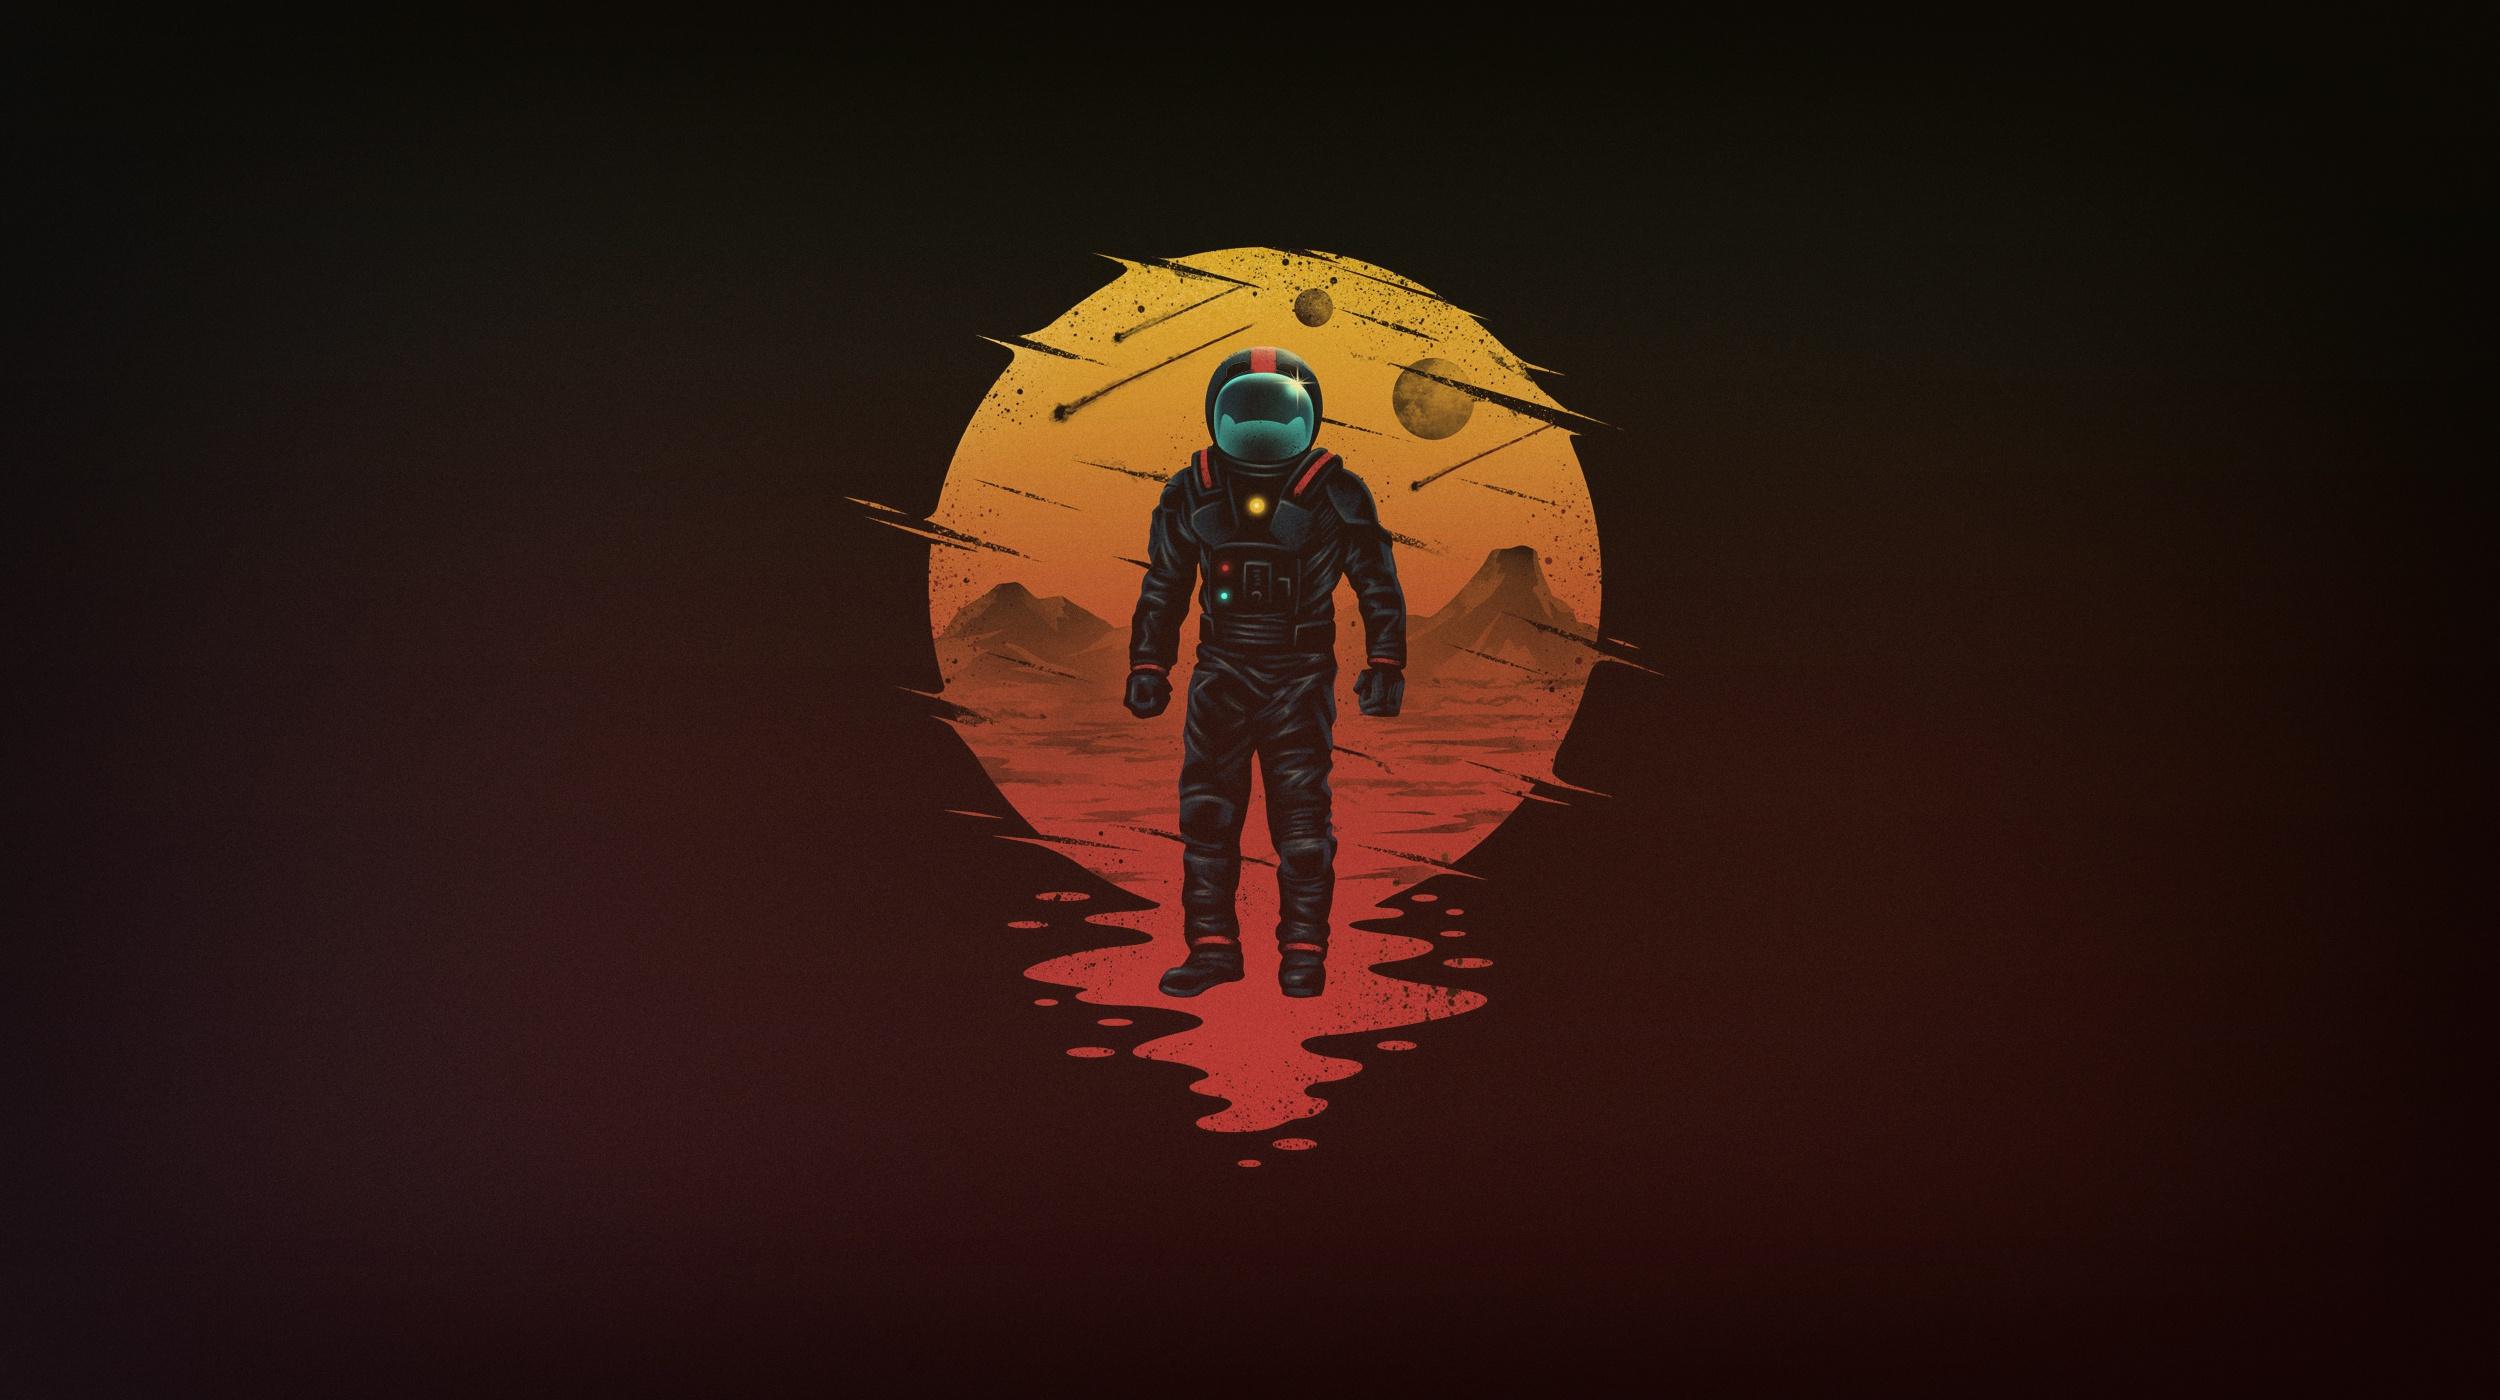 Astronaut Space Space Art - Astronaut Moon Art , HD Wallpaper & Backgrounds